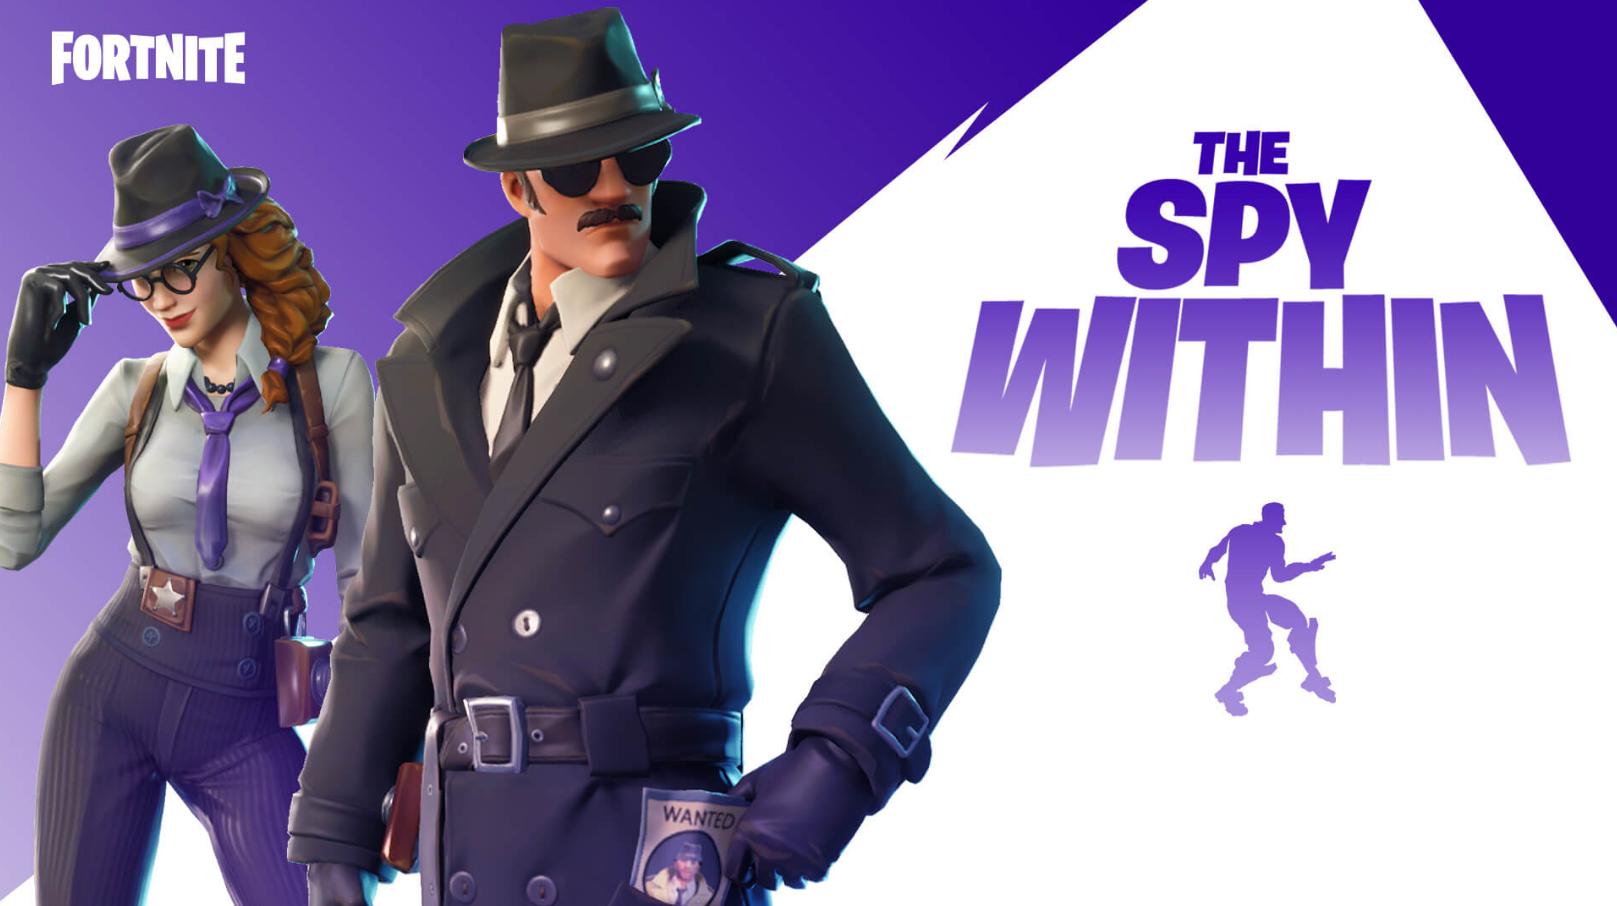 Epic Games хайпит: в Fortnite появился режим в стиле хитовой Among Us с Агентами и Шпионами